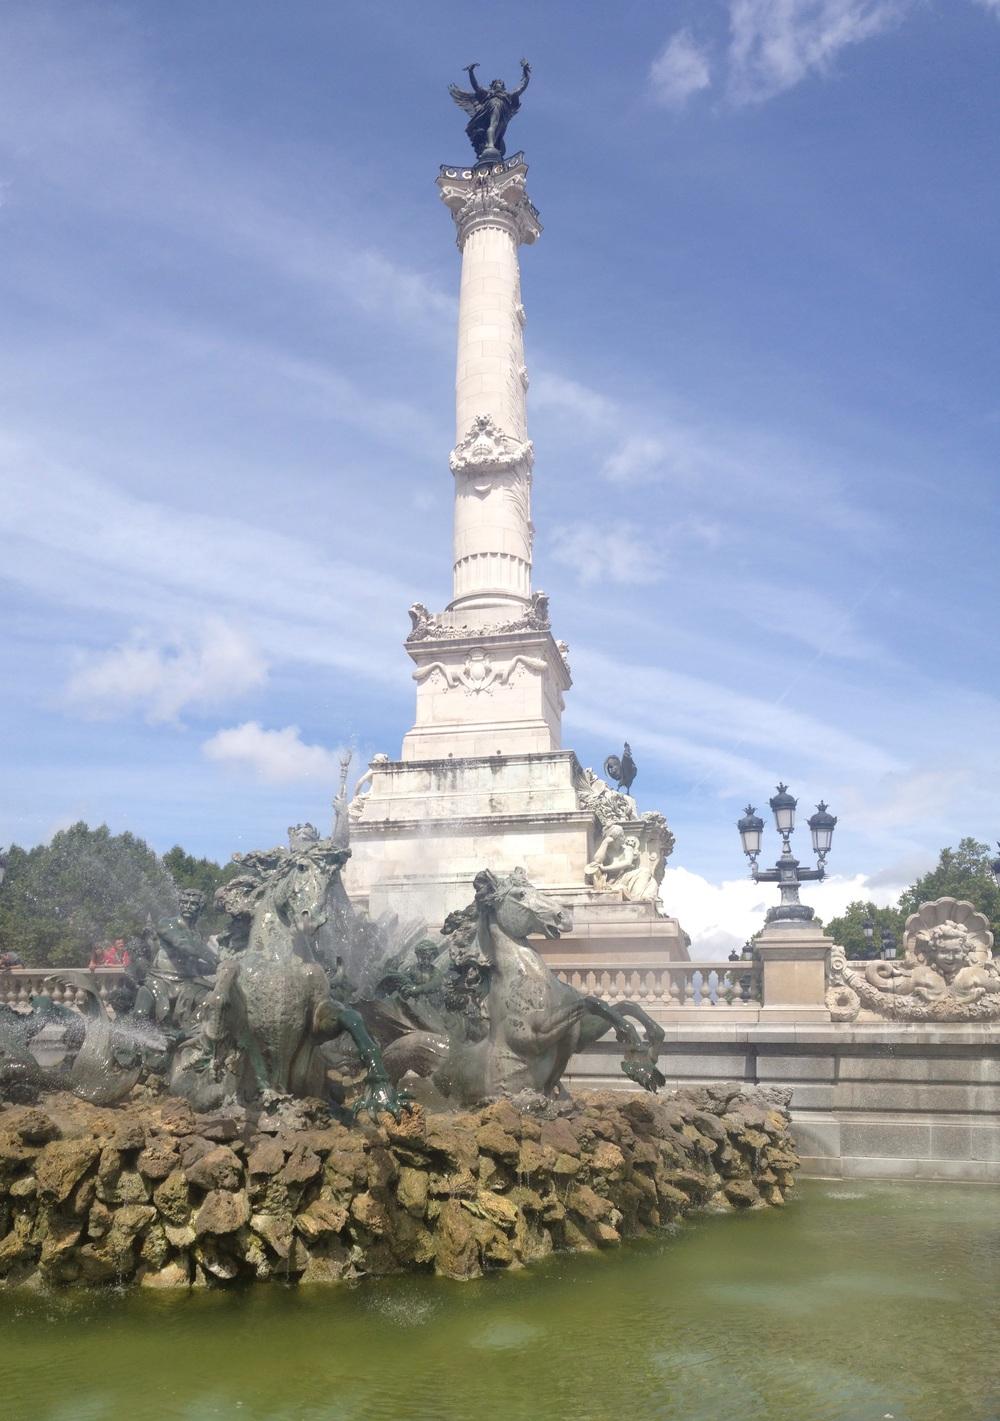 A rather impressive statue